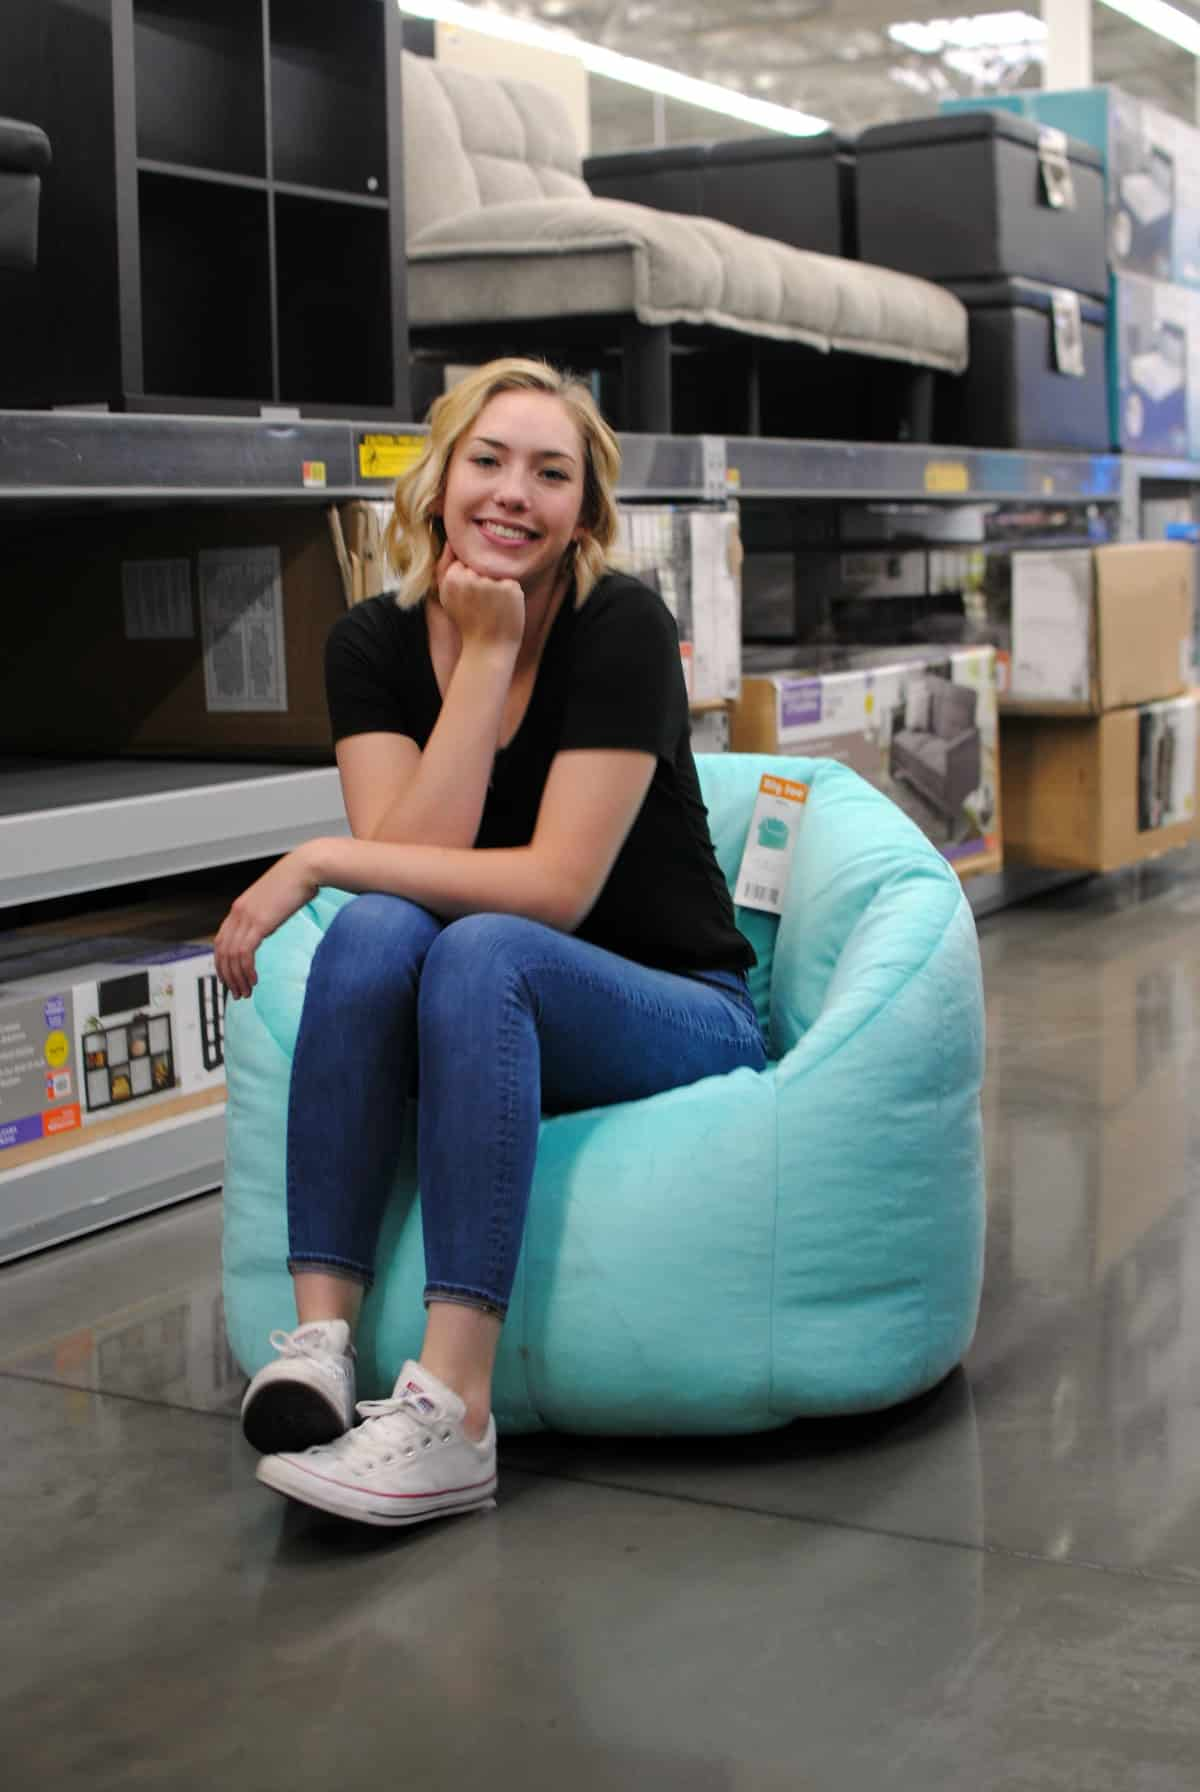 Big Joe Bean Bag chair from Walmart